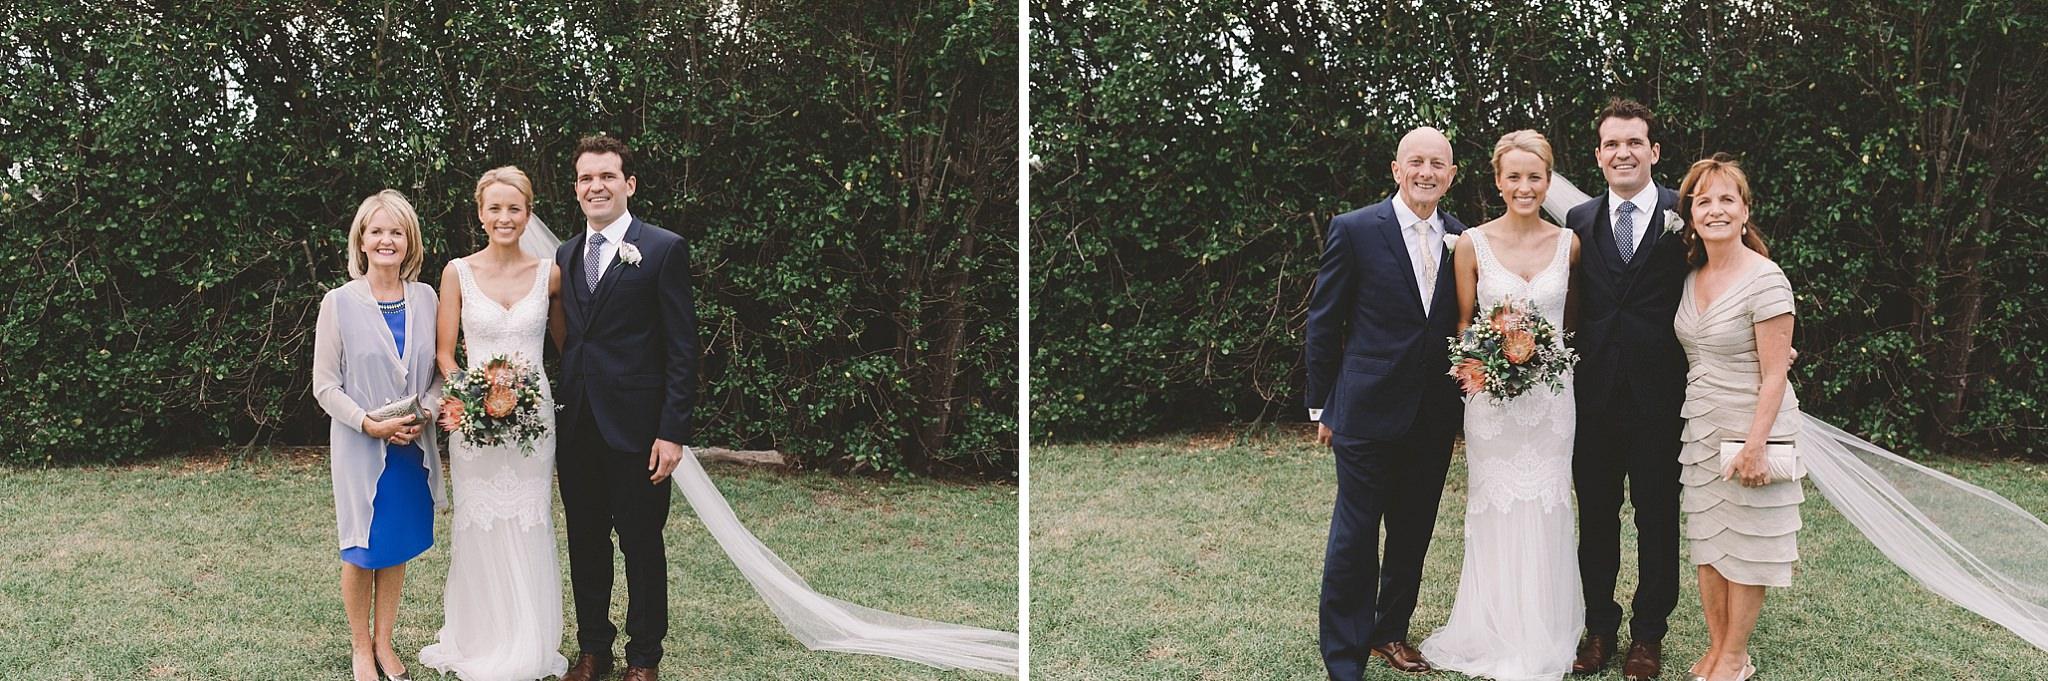 Warnambool Wedding Photographer_0046.jpg